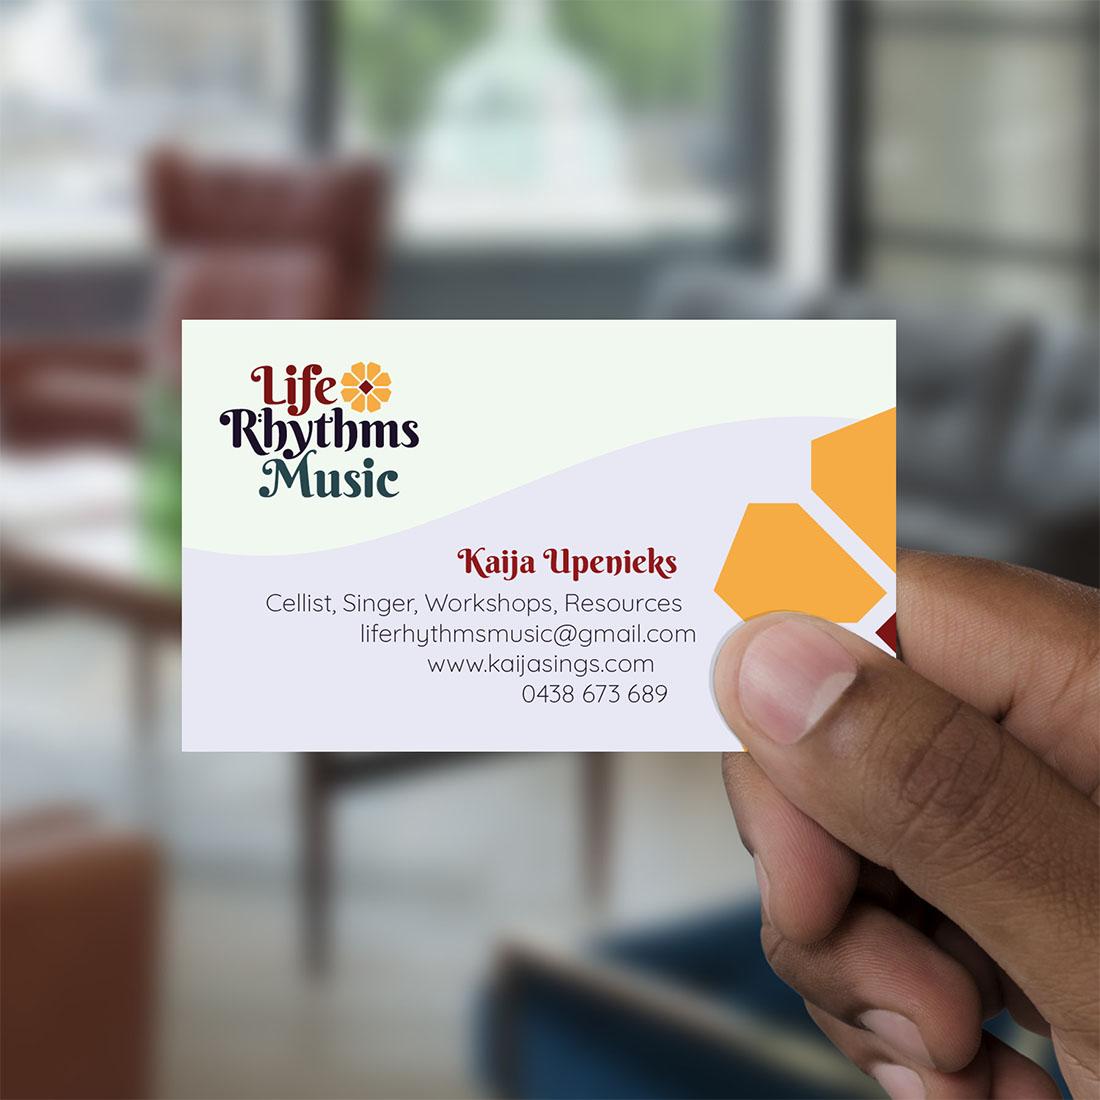 Life Rhythms Music, Business Card Design.